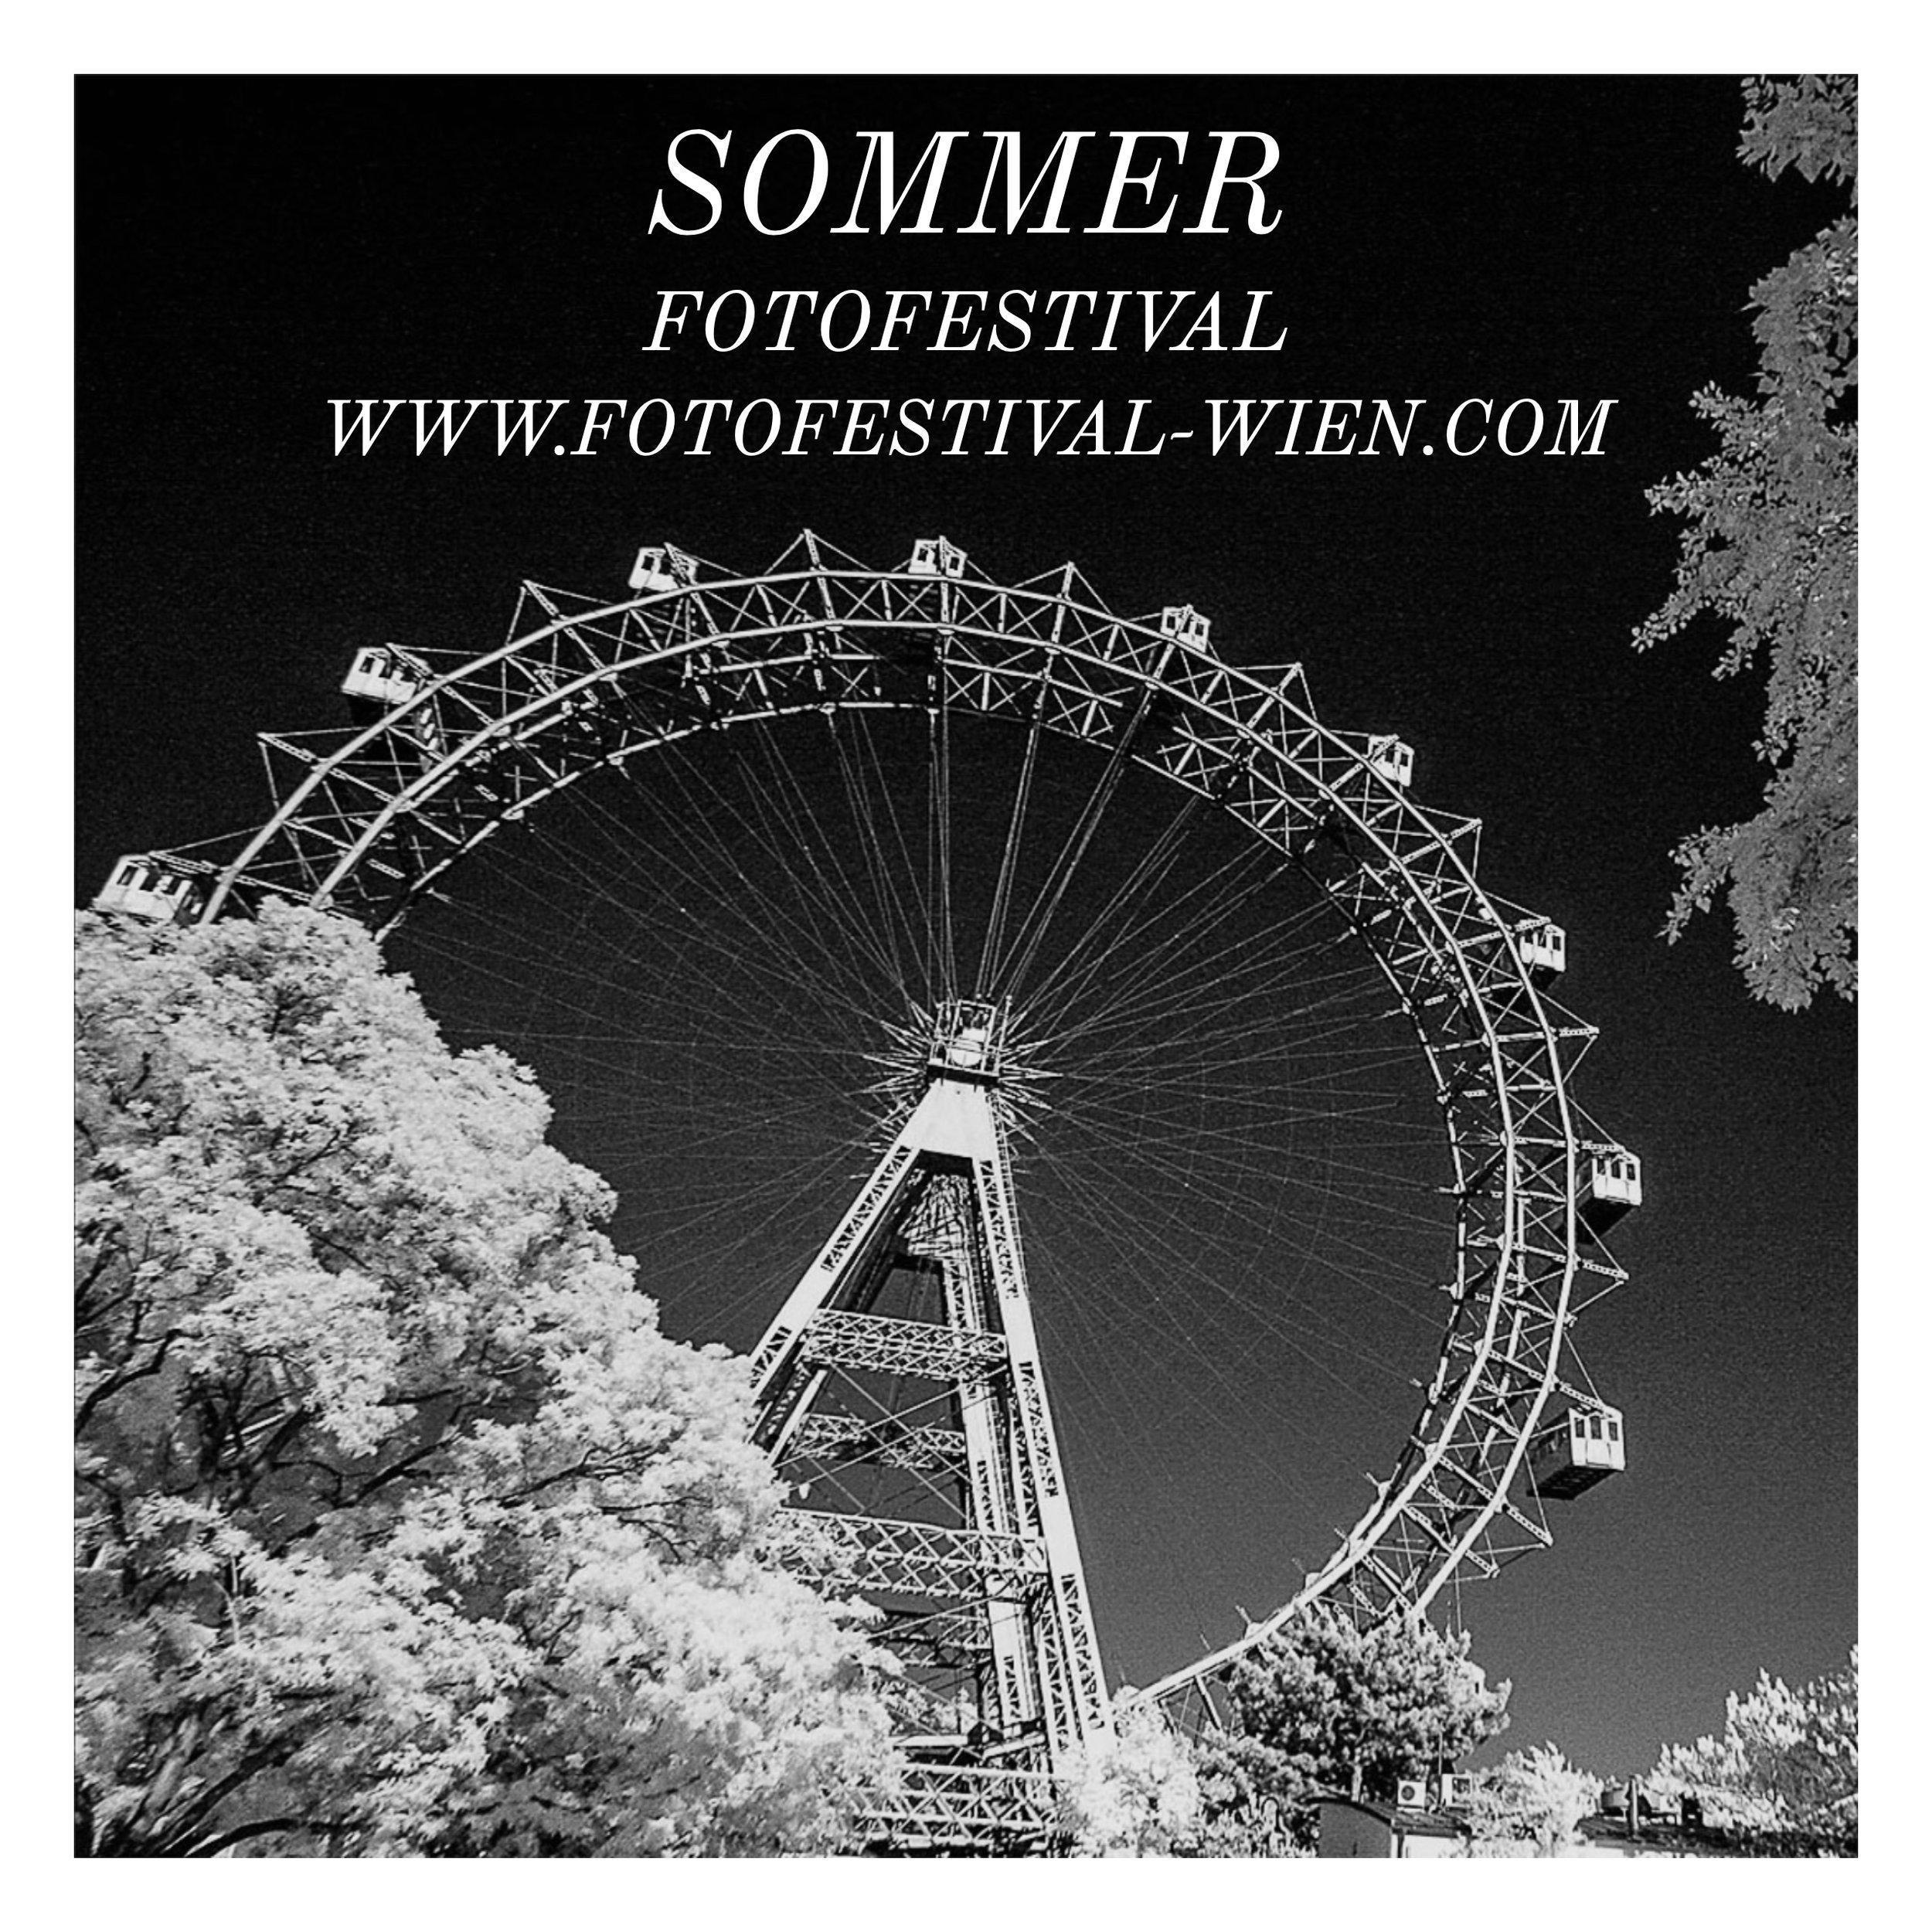 Wien Sommer Fotofestival .jpg